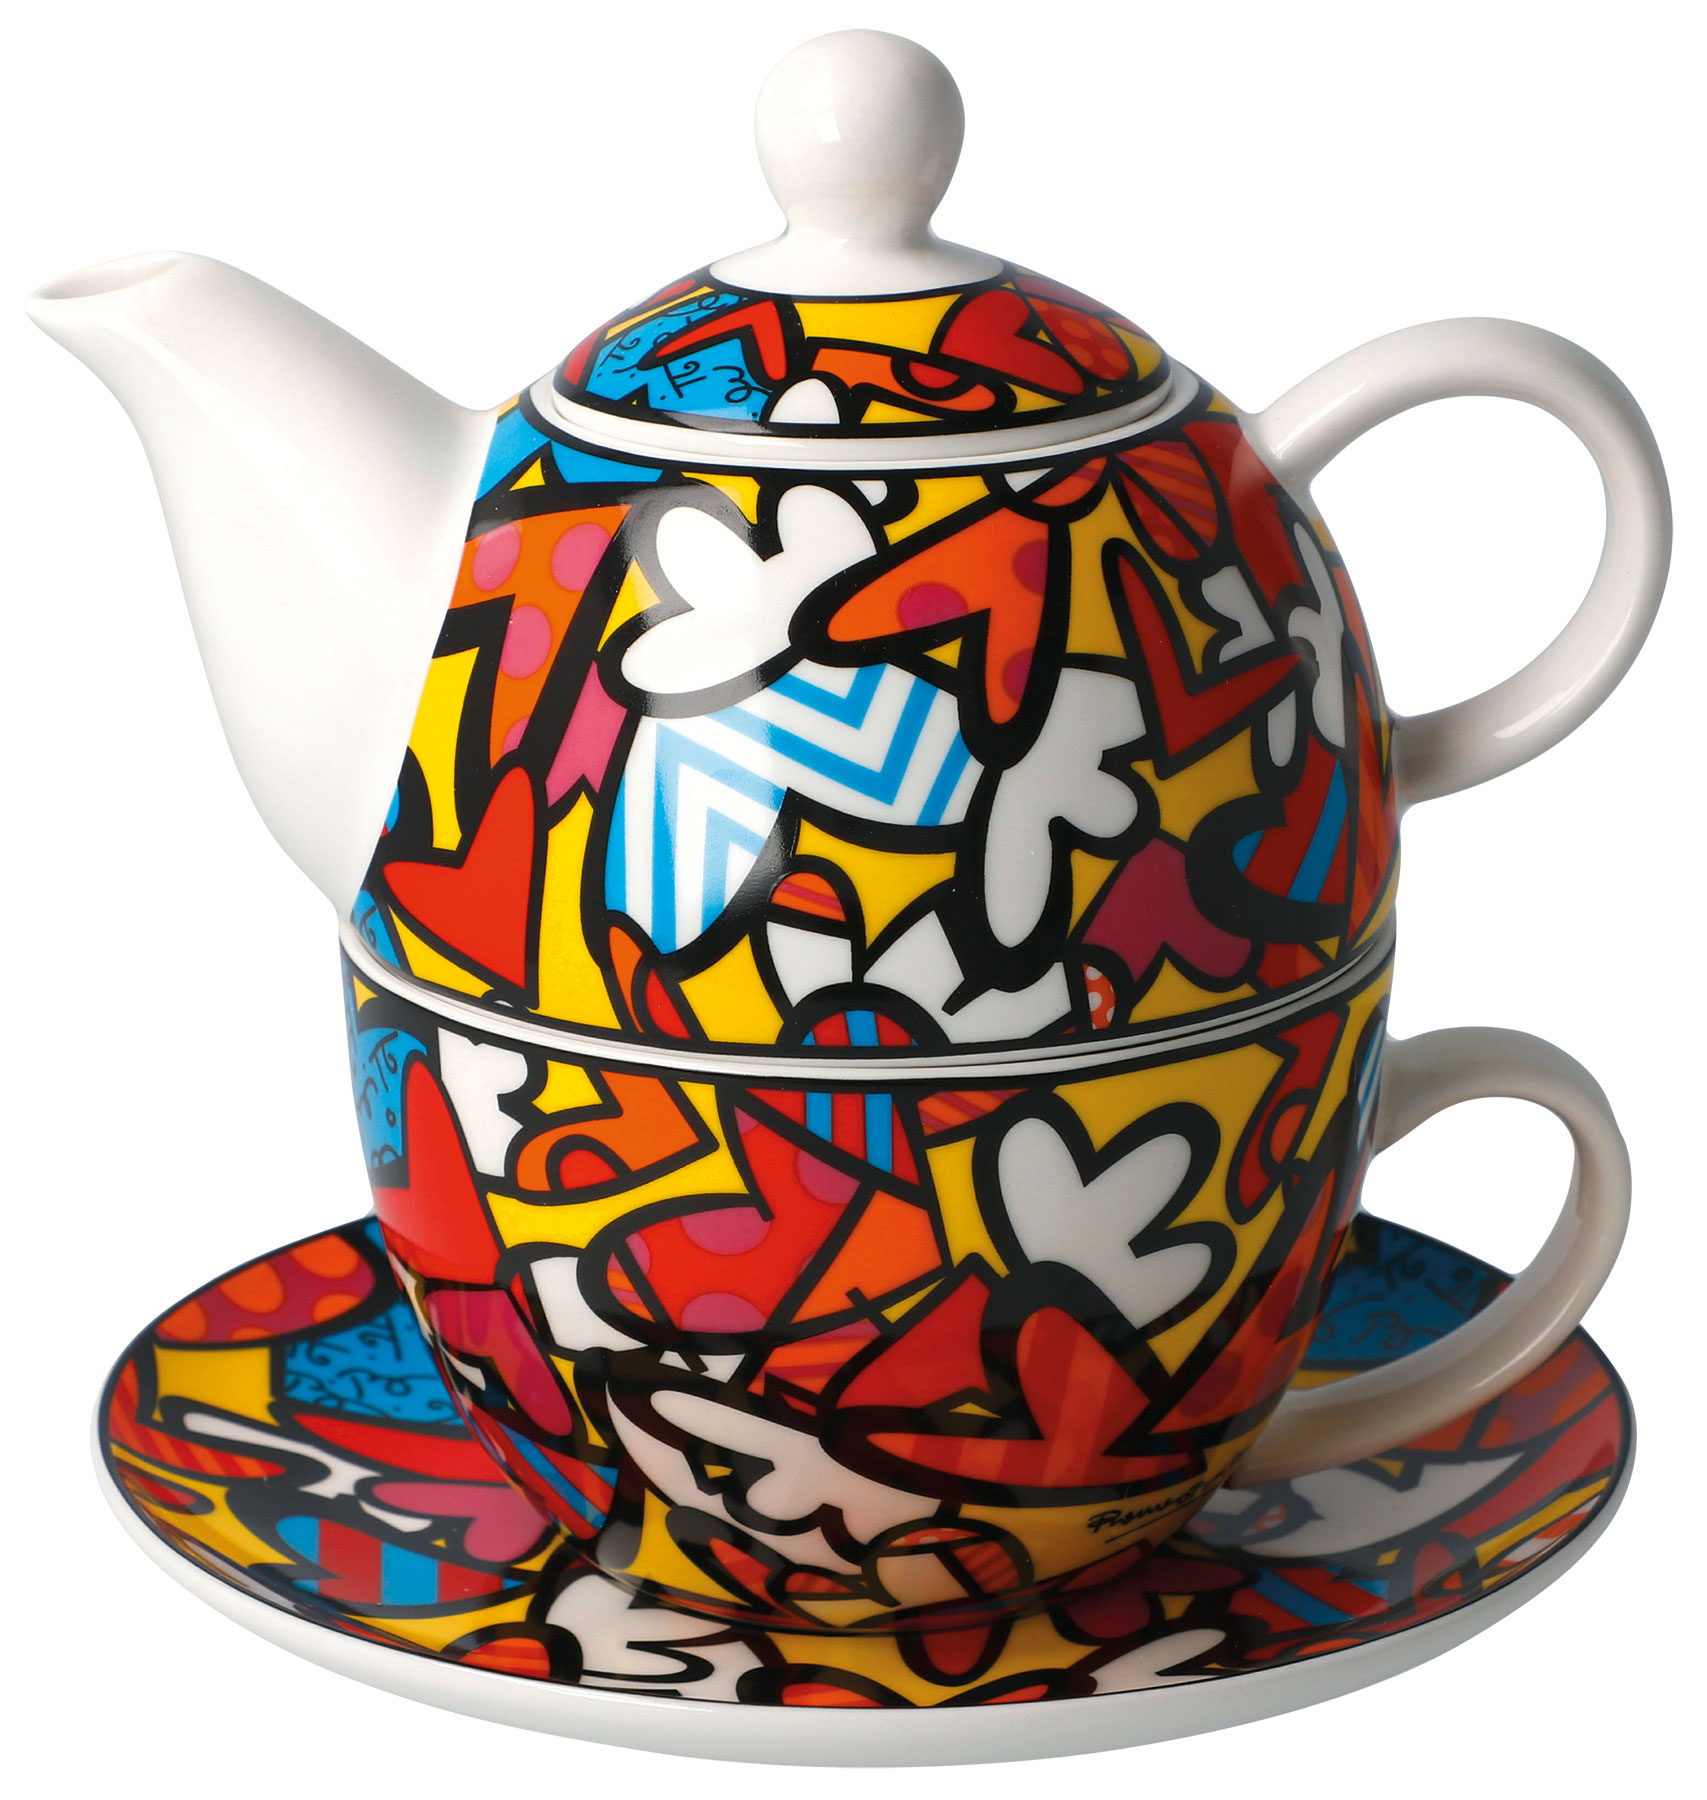 "Teekanne mit integrierter Tasse ""All we need is love"", Porzellan"